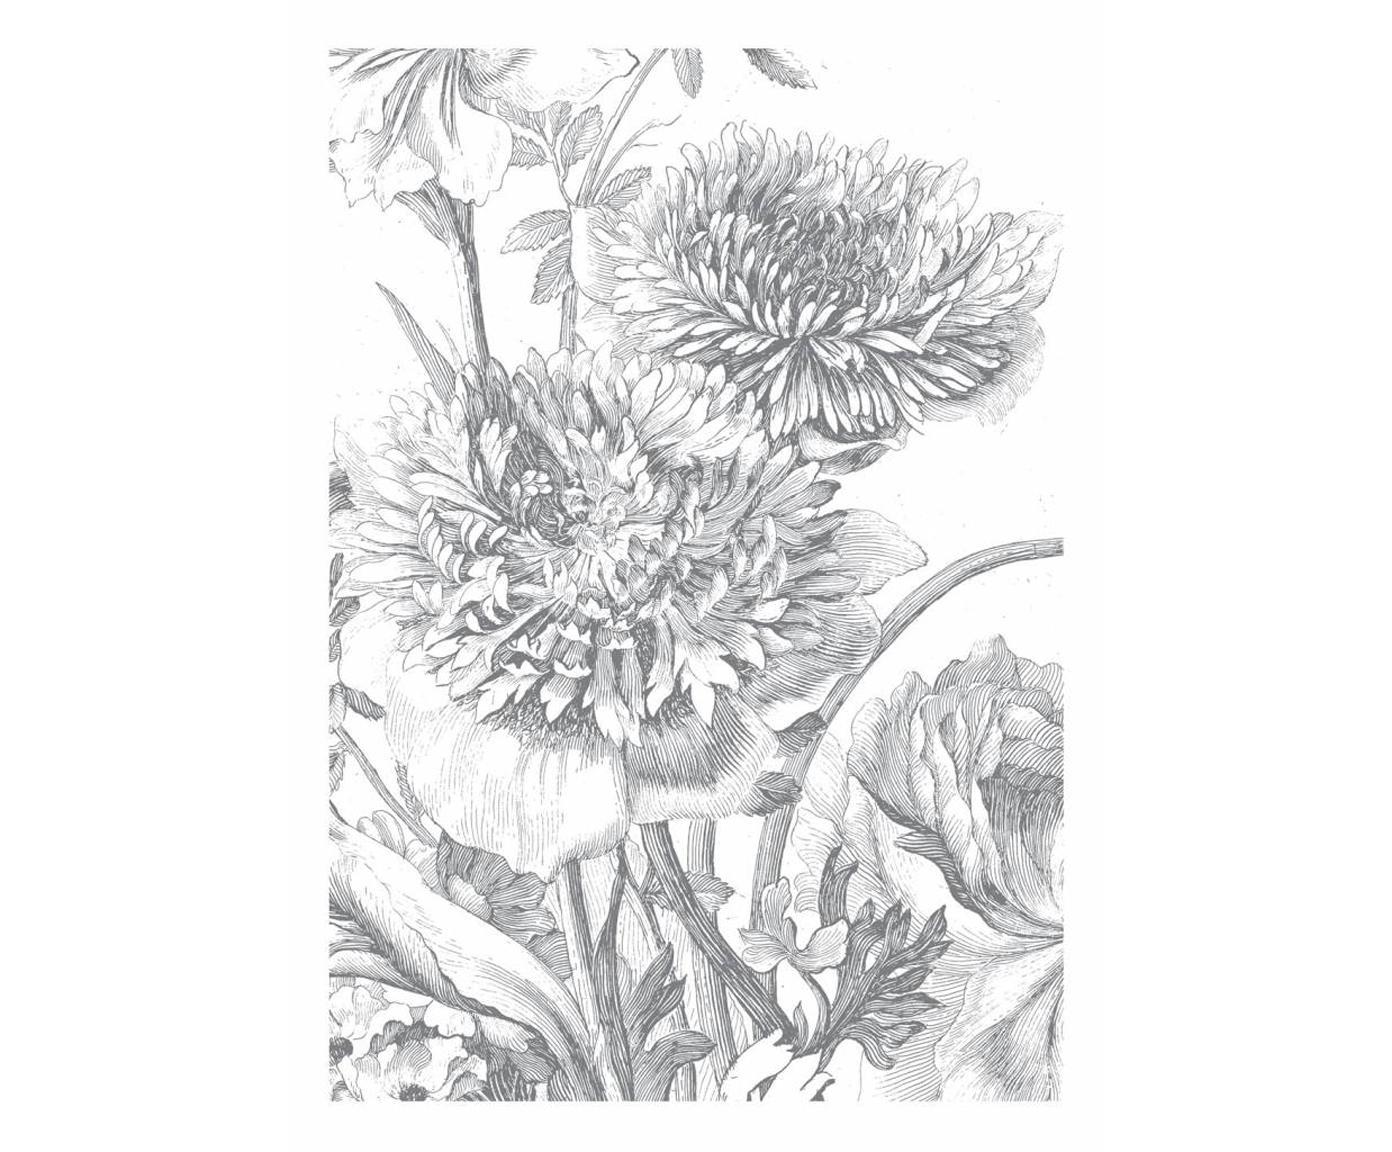 Carta da parati Engraved Flowers, Tessuto non tessuto, ecologico e biodegradabile, Grigio, bianco, Larg. 195 x Alt. 280 cm